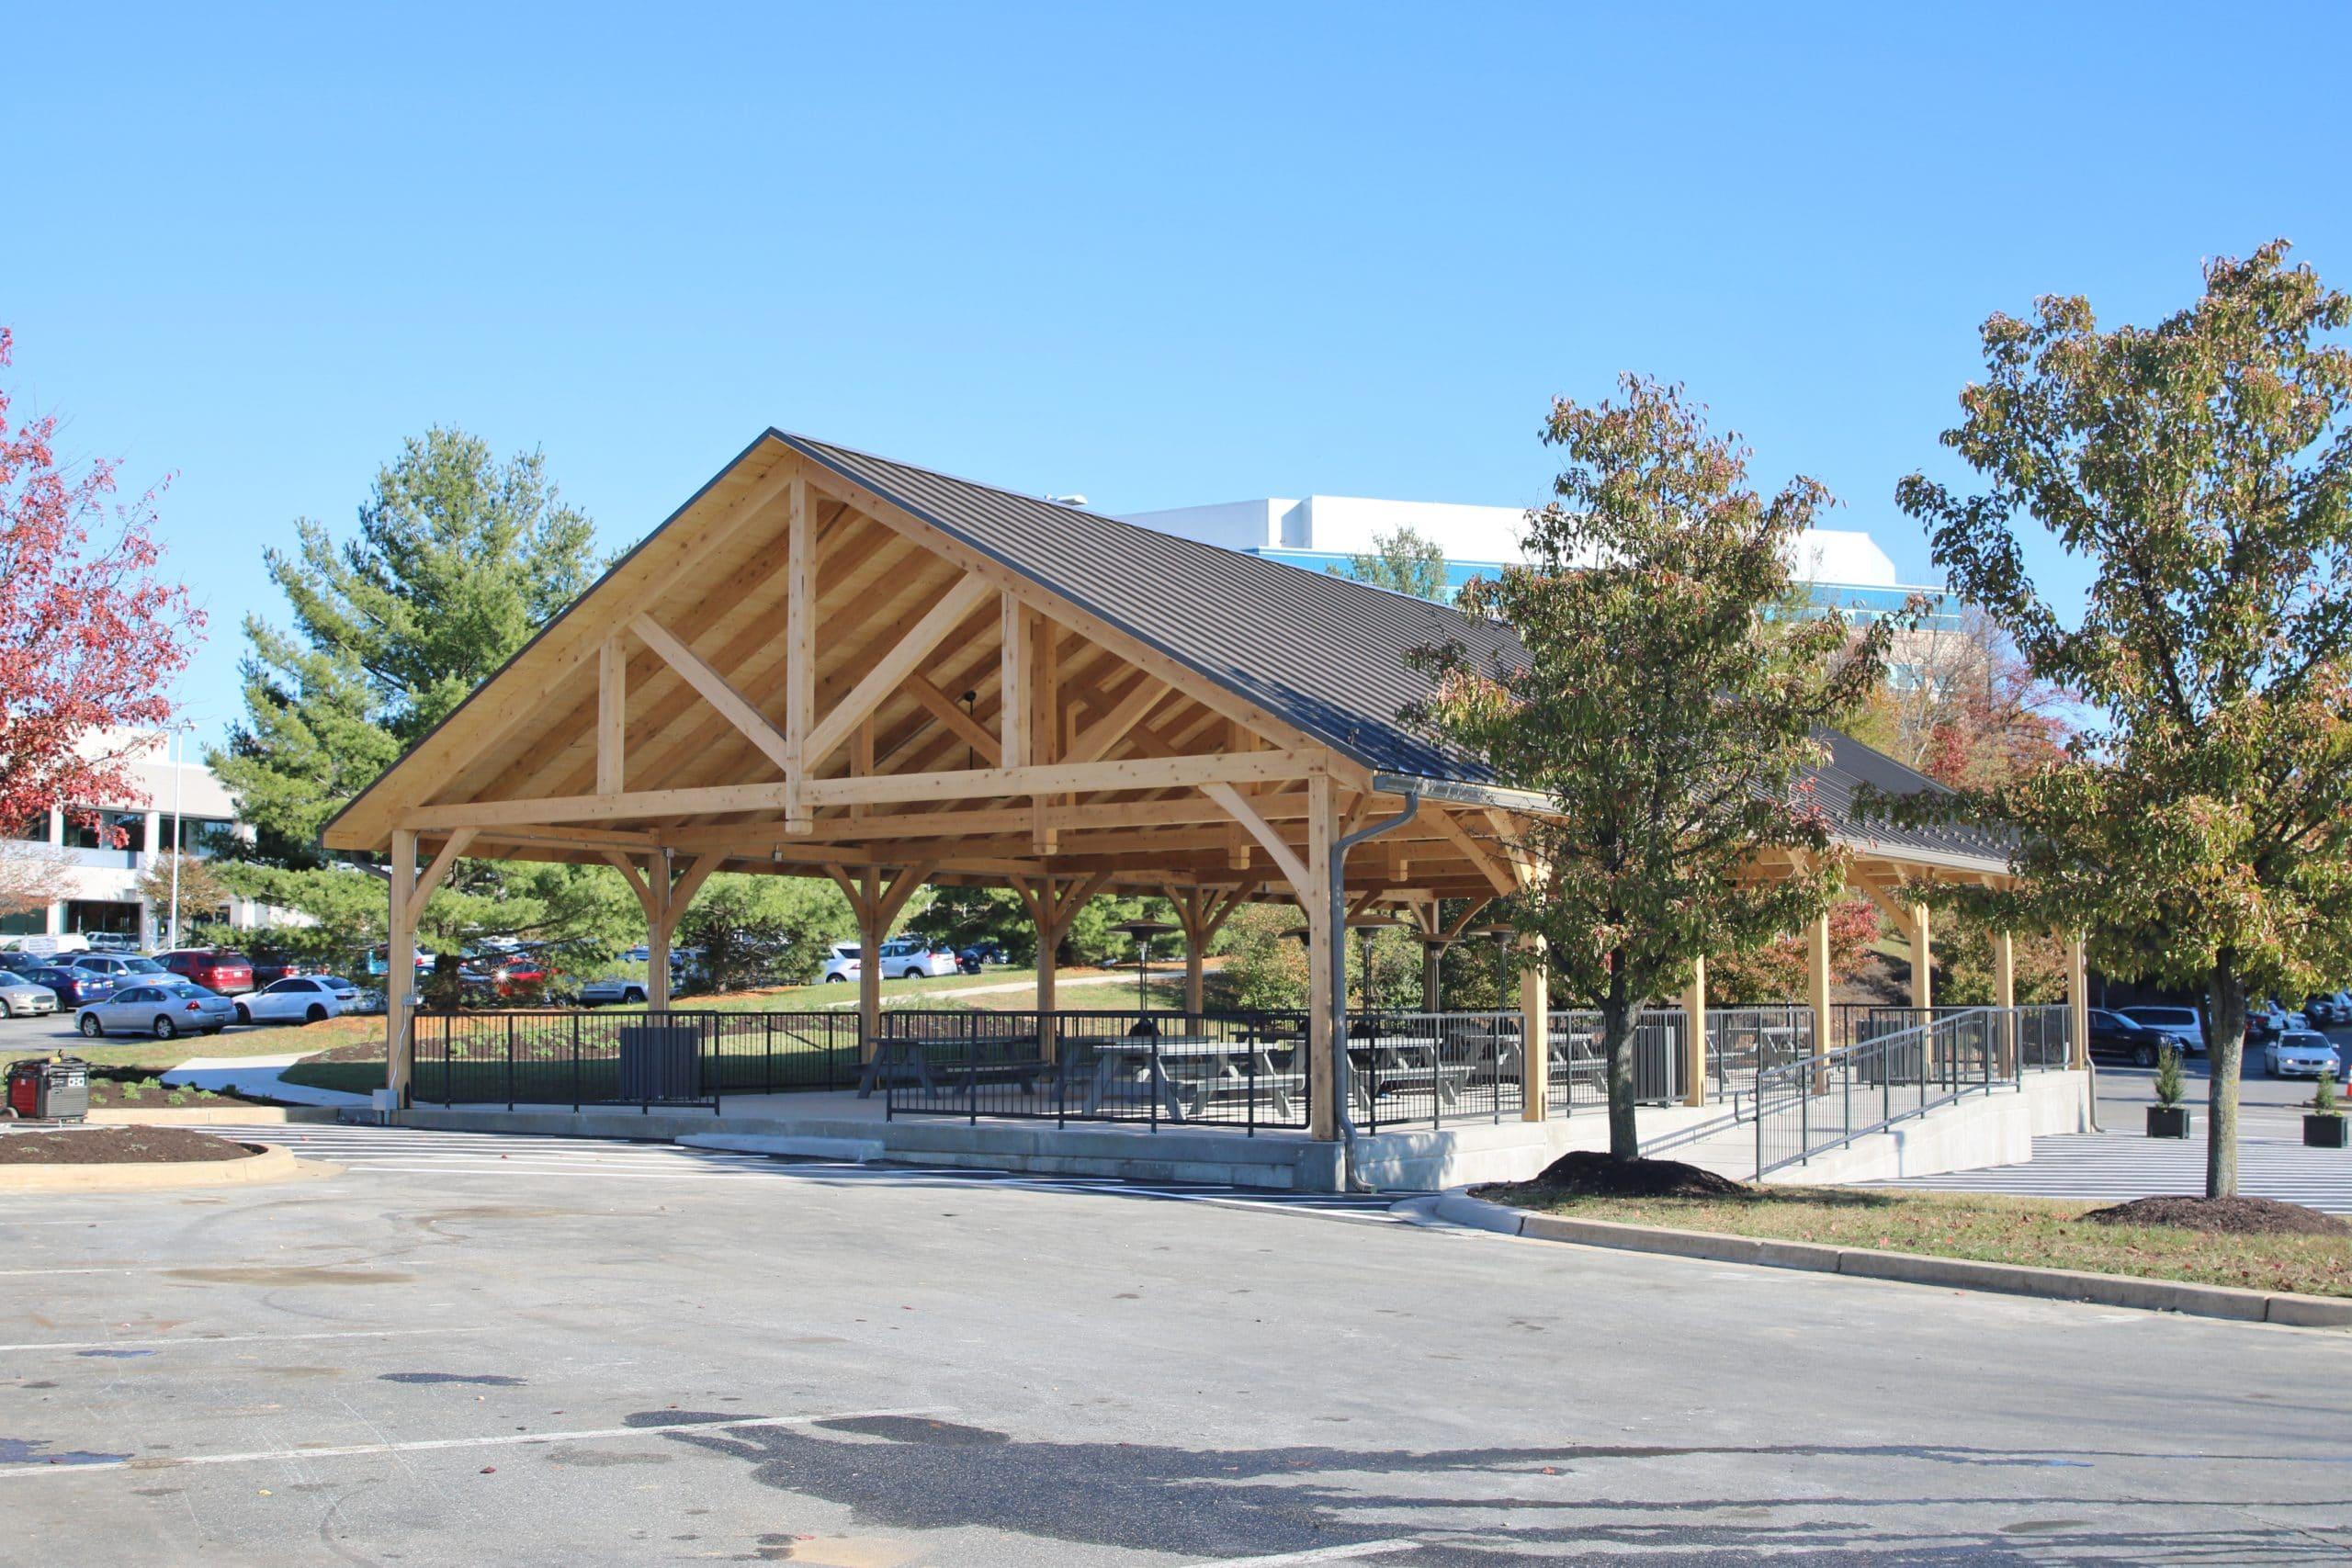 40x80 Kingston Timber Frame Pavilion 1